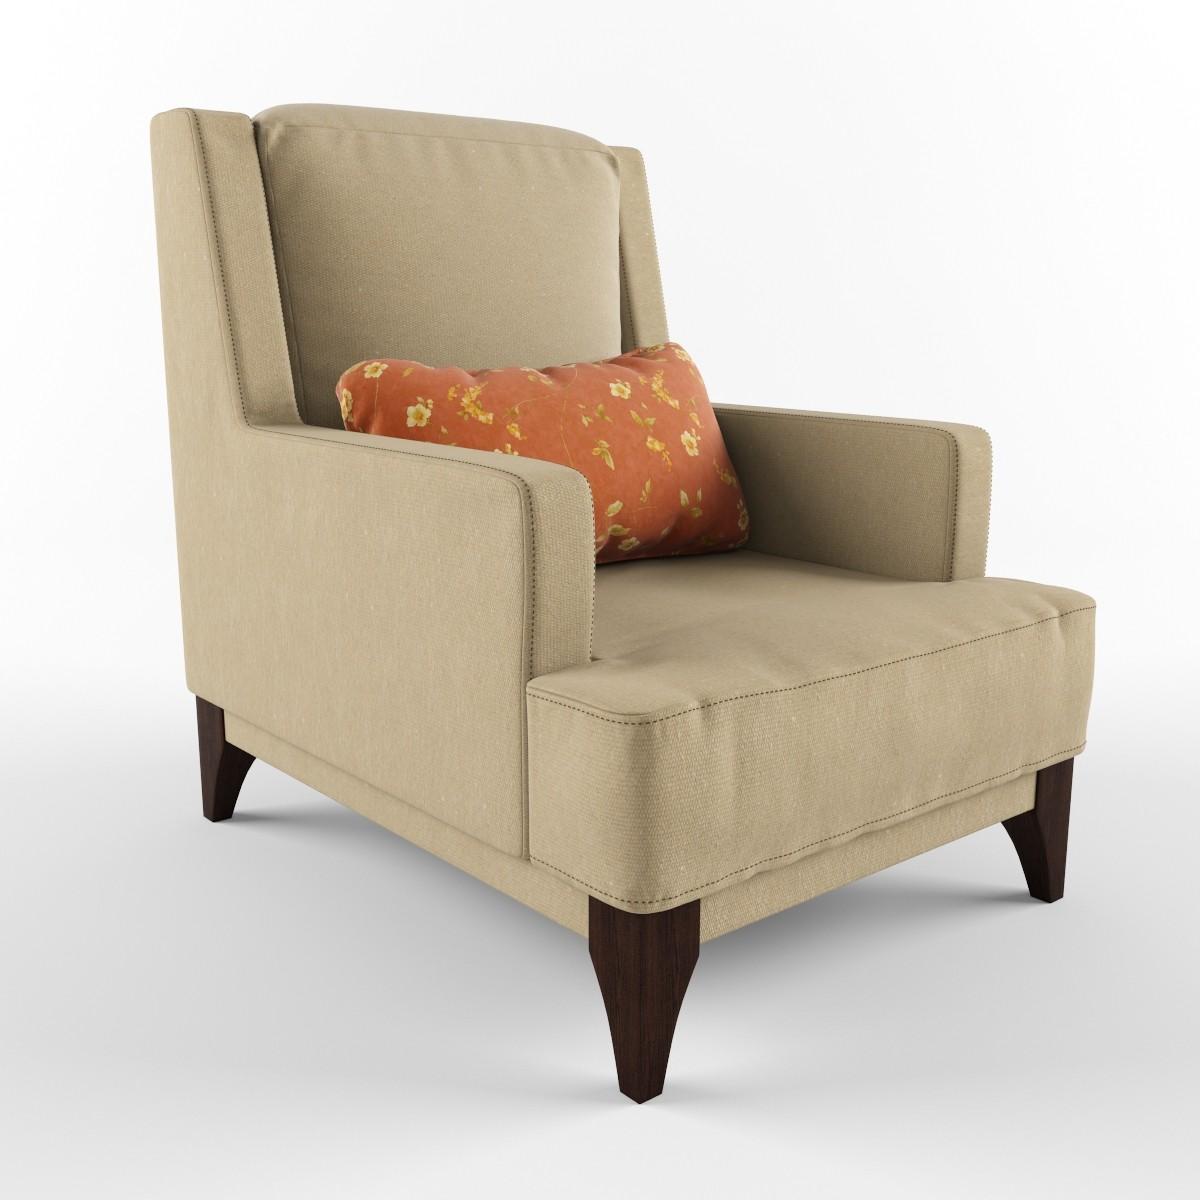 soft_chair_d_render1.jpg